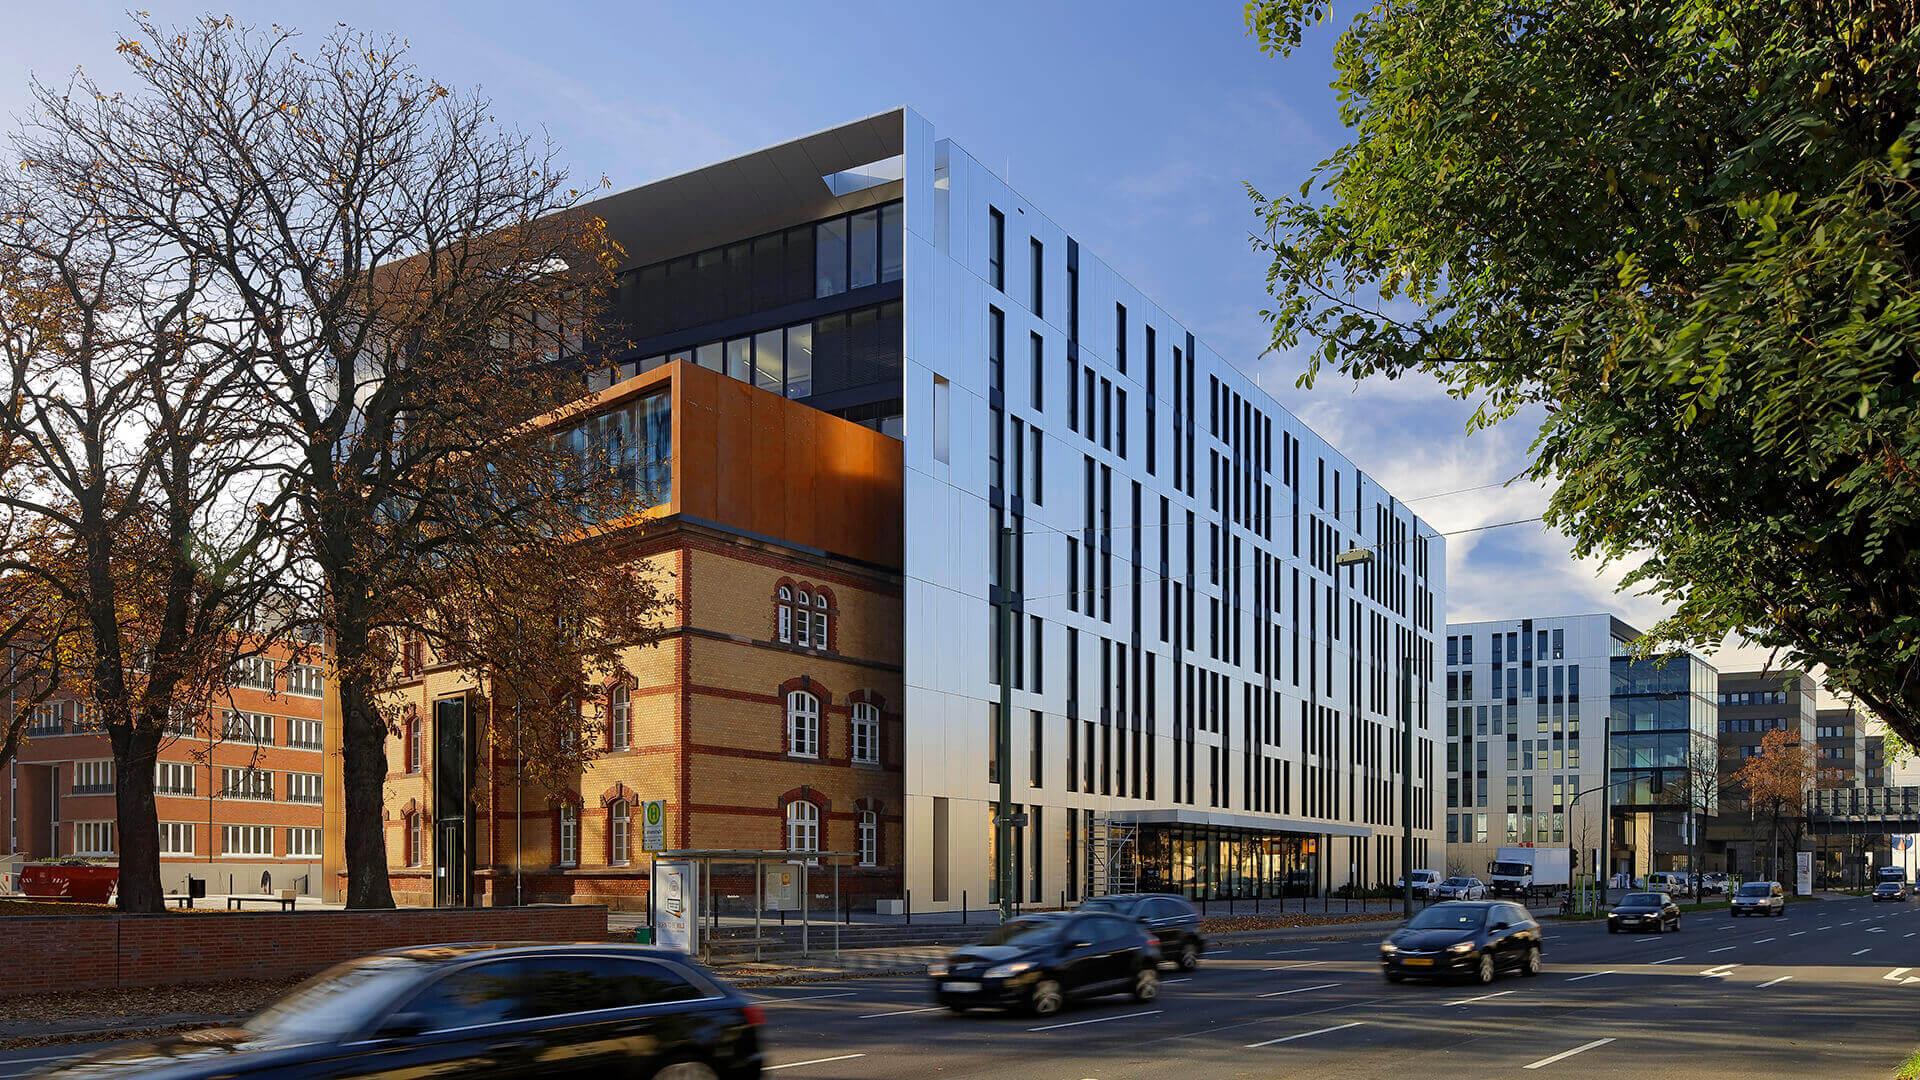 Architekten Düsseldorf architekturbüro slapa oberholz pszczulny